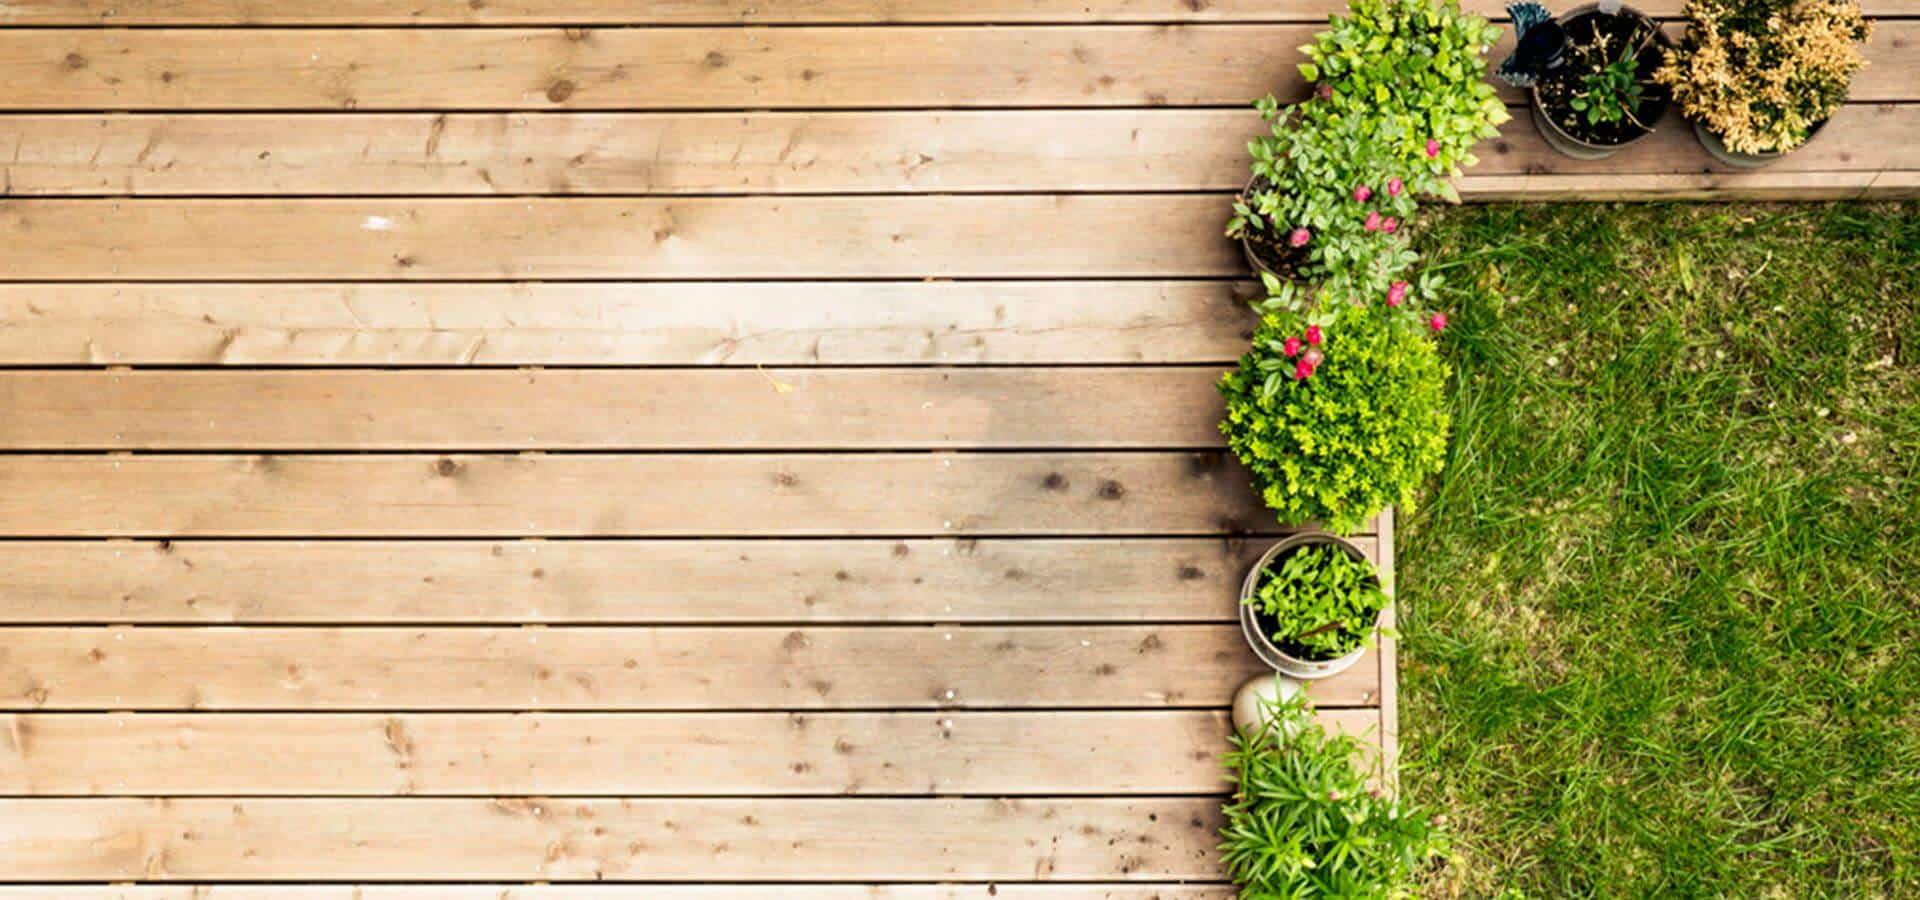 jardinage et bricolage slide3 fullcontent